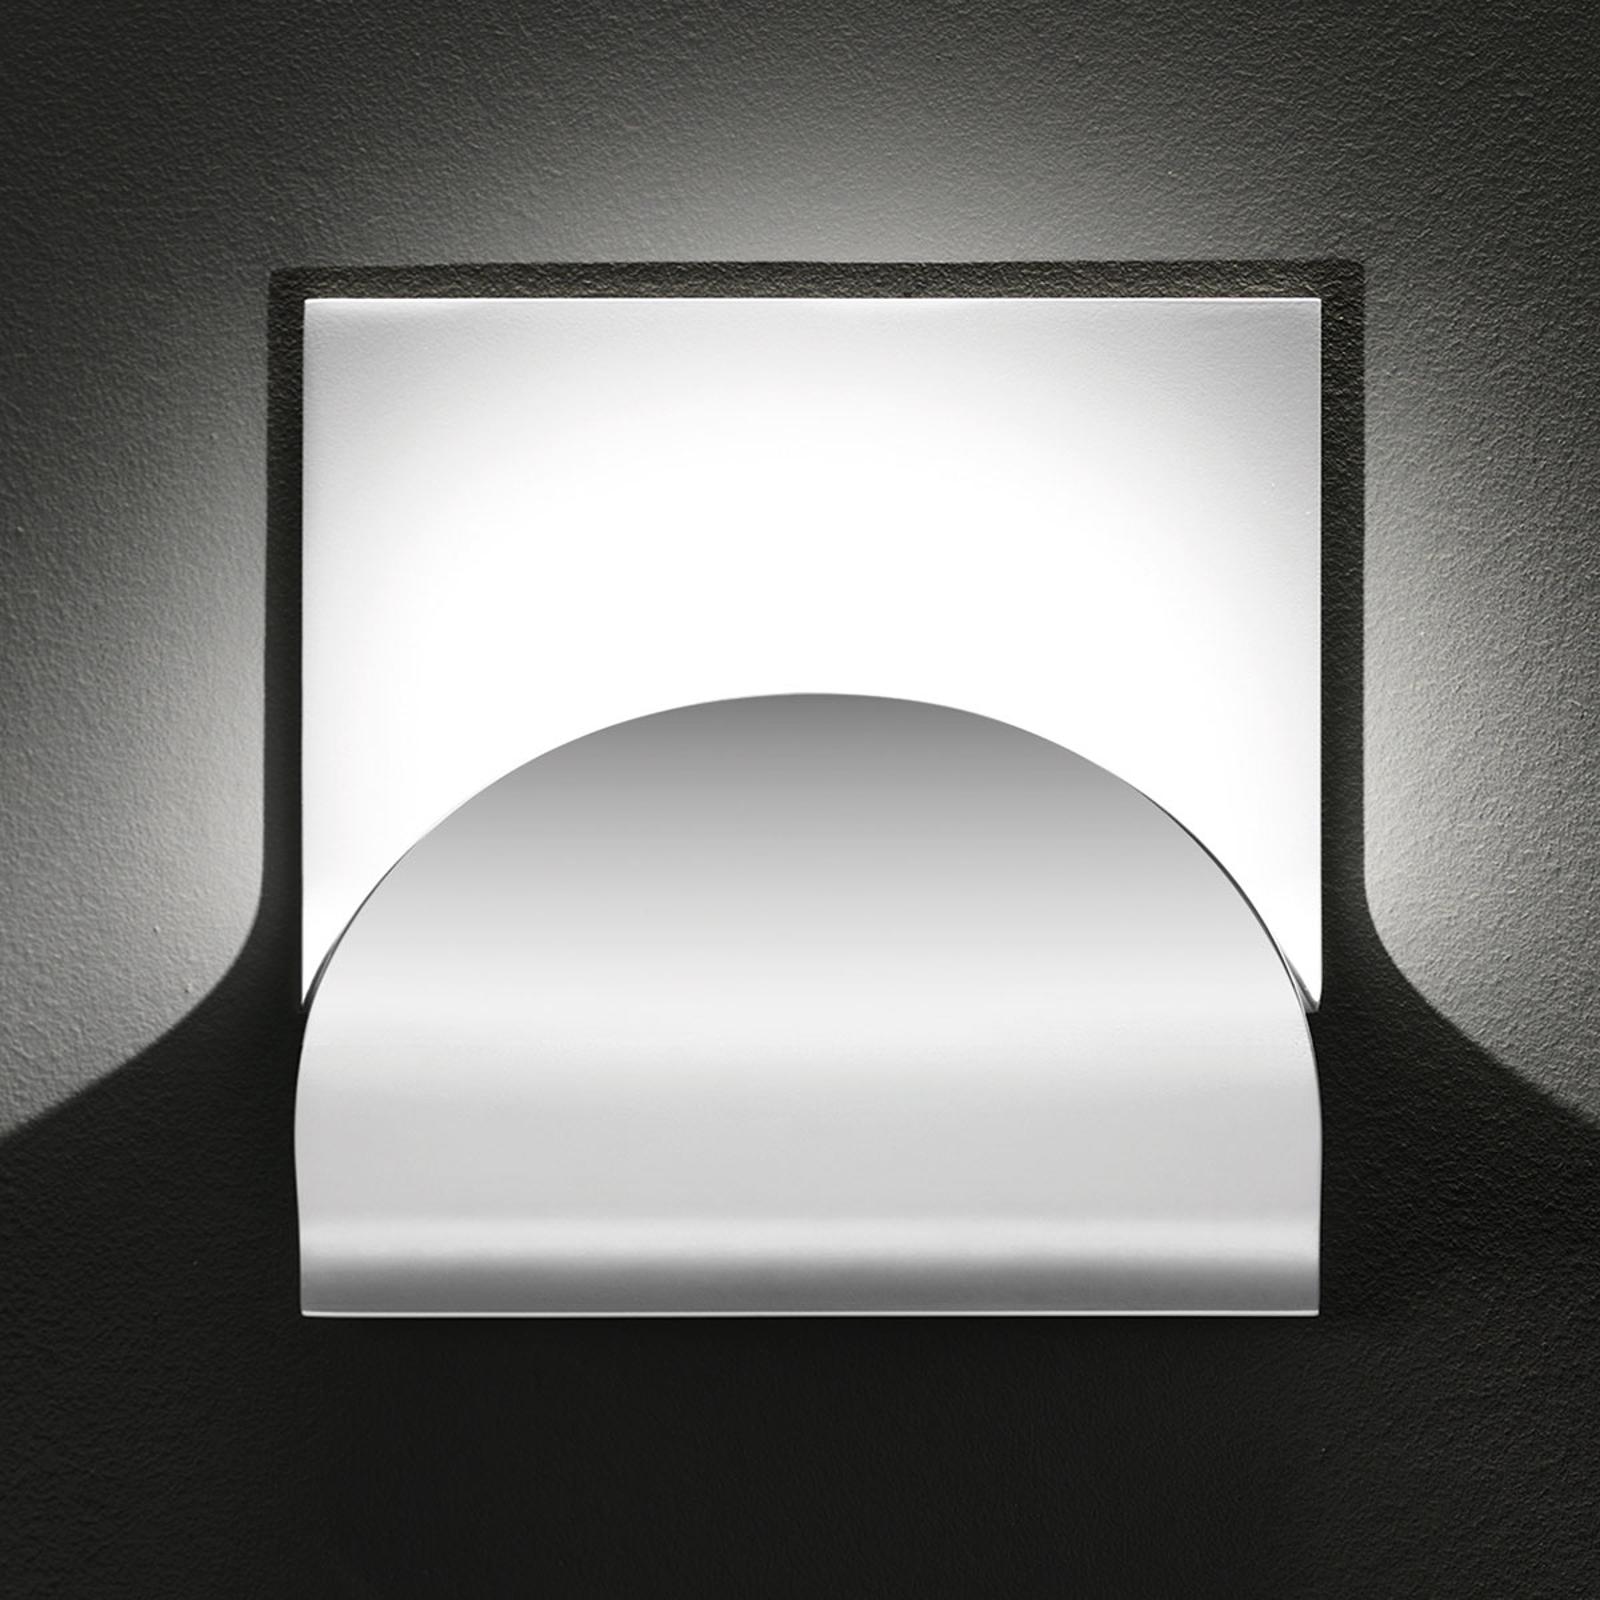 Cini&Nils Incontro applique LED blanc